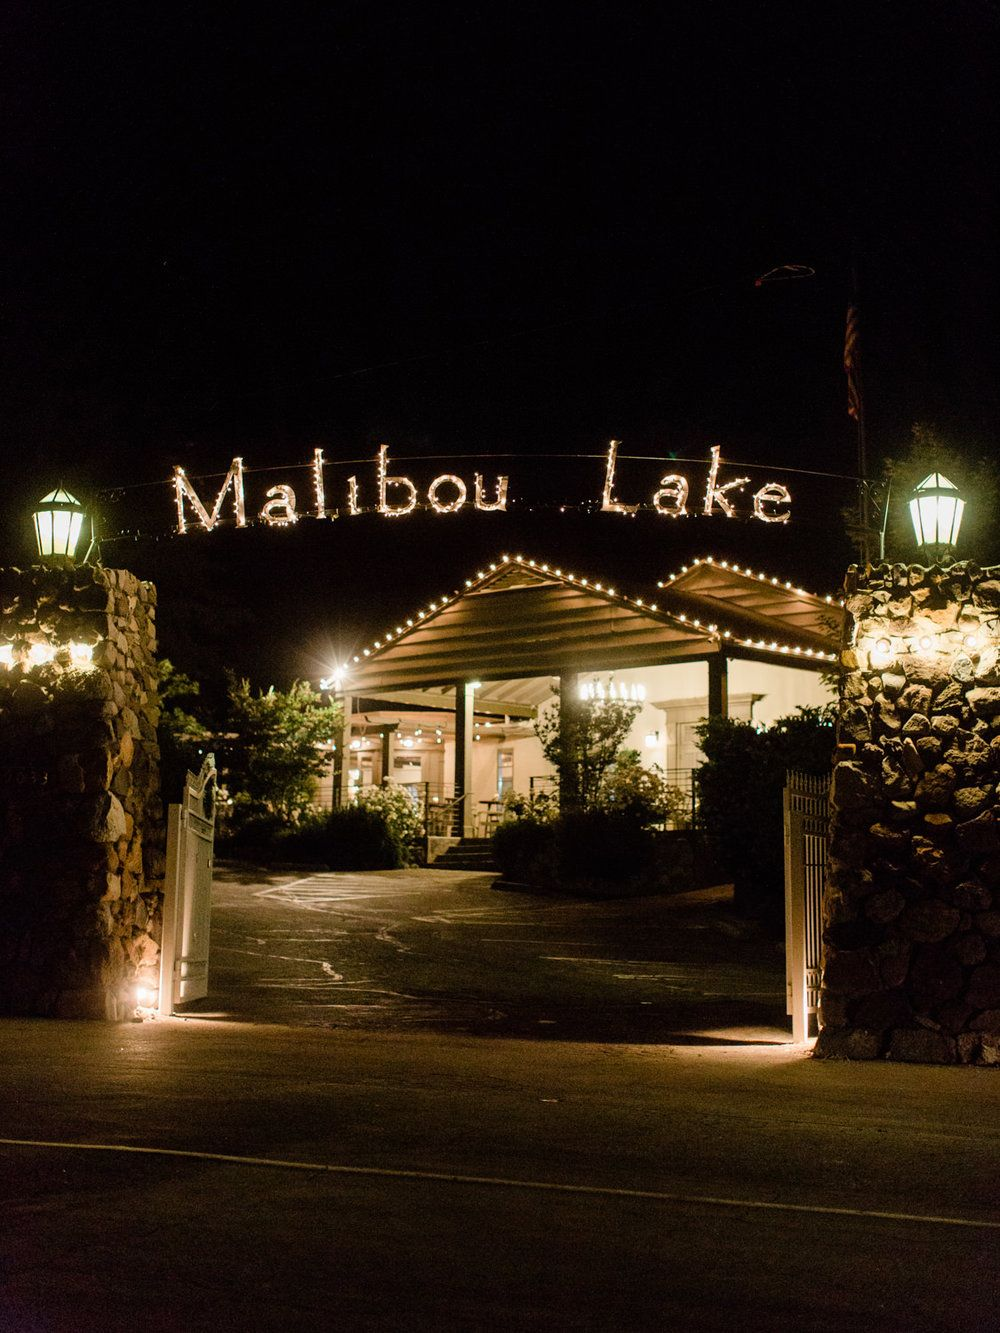 The Lodge at Malibou Lake Wedding Venue Where Malibu